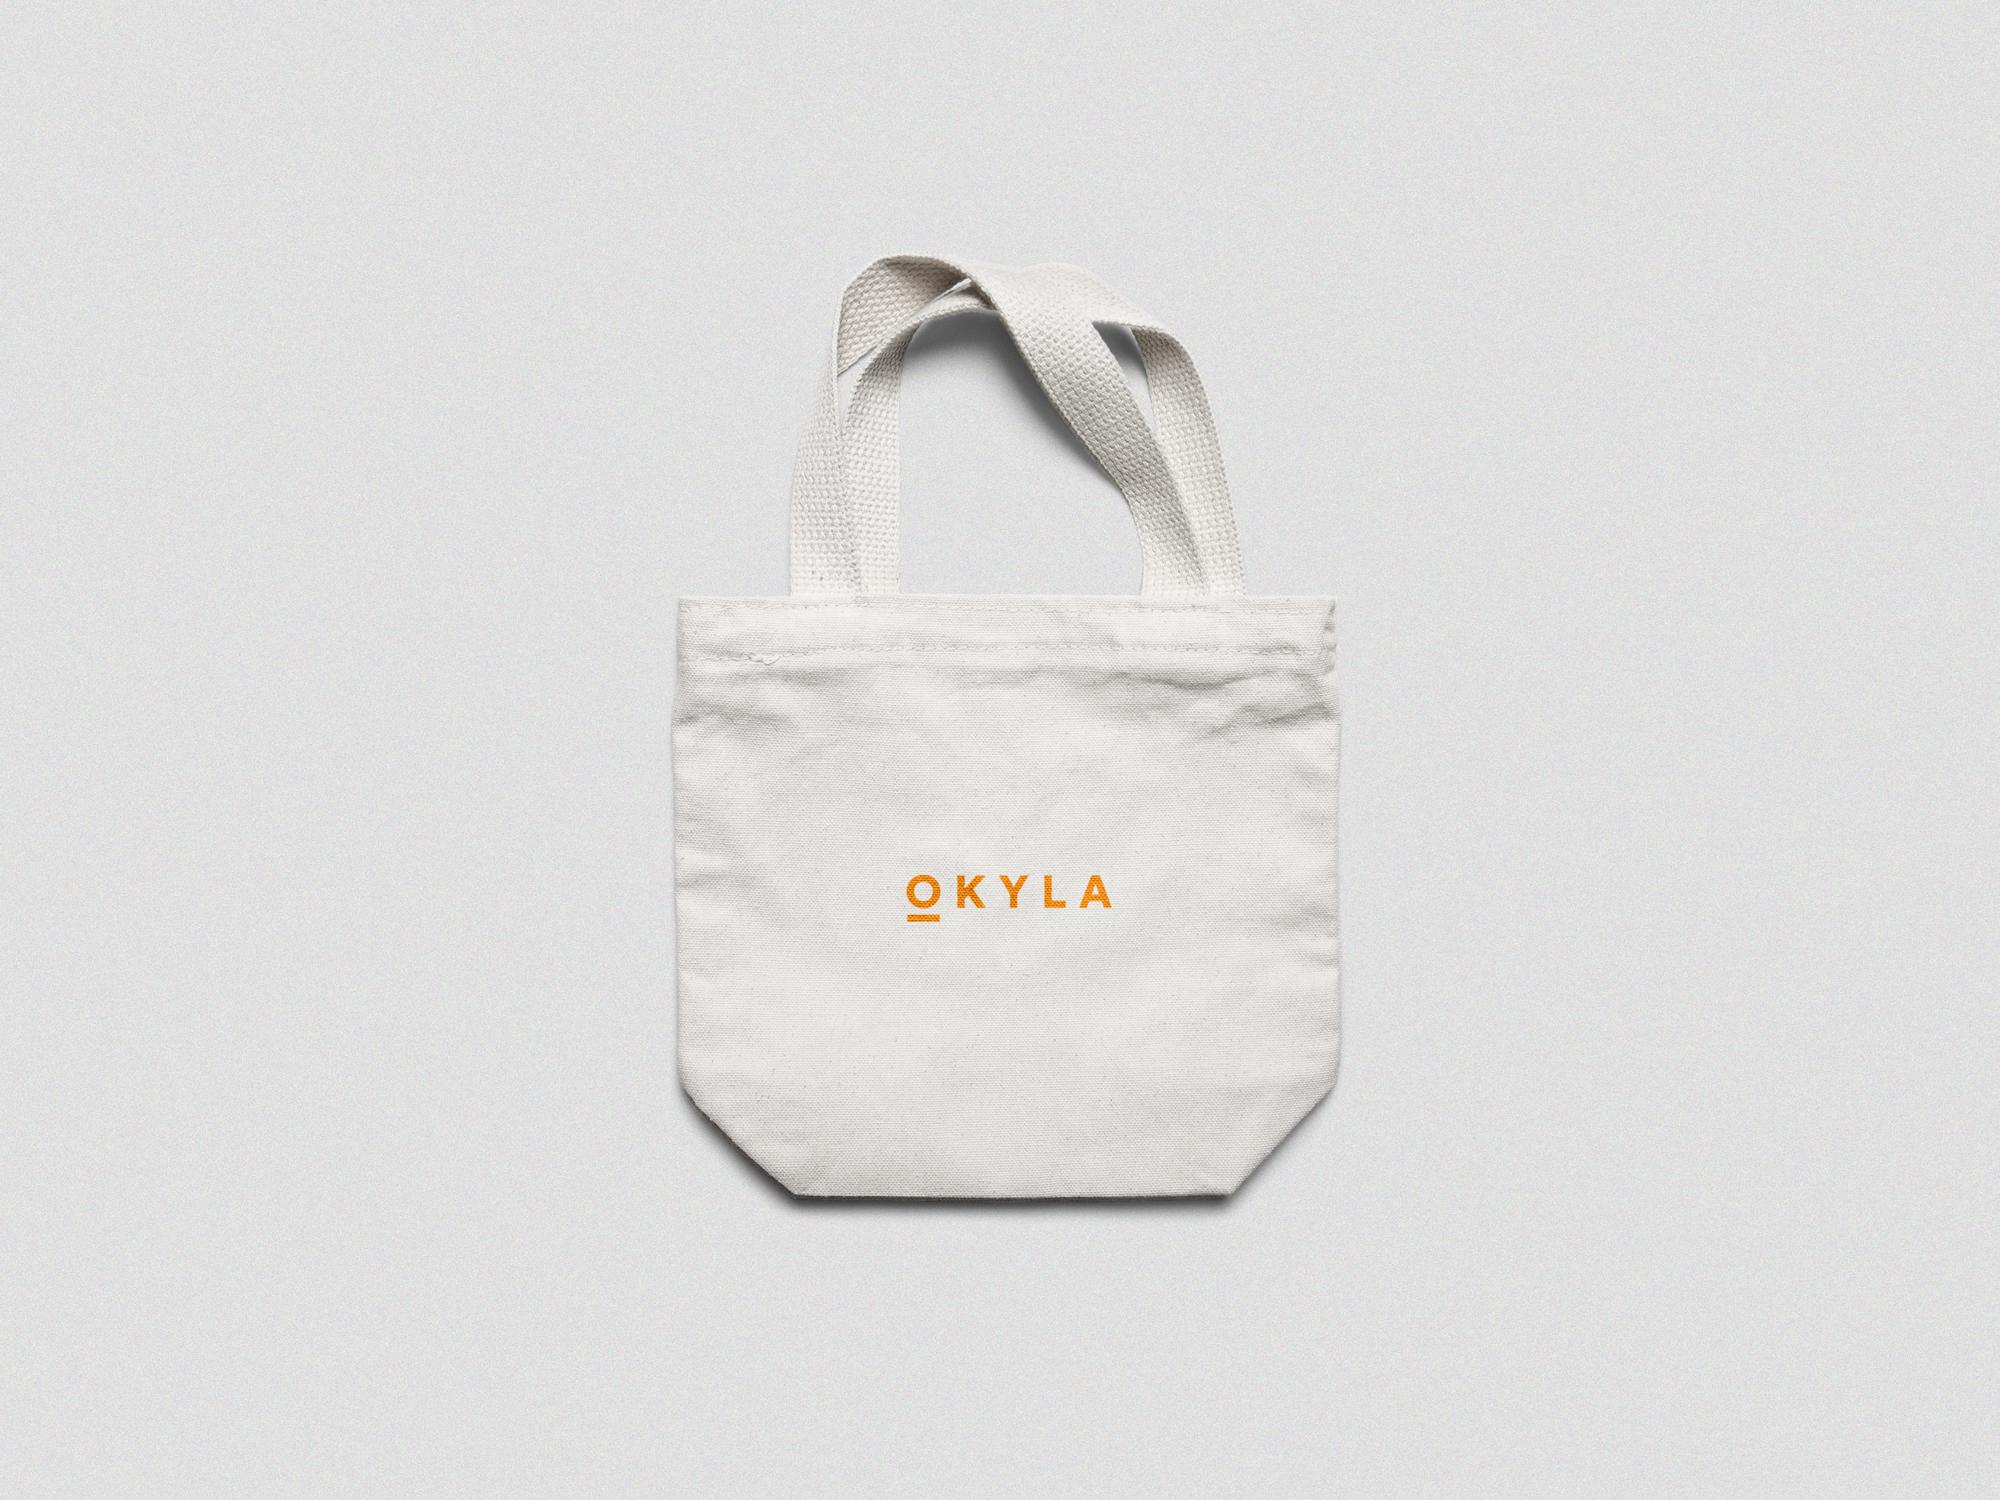 Okyla_4.jpg